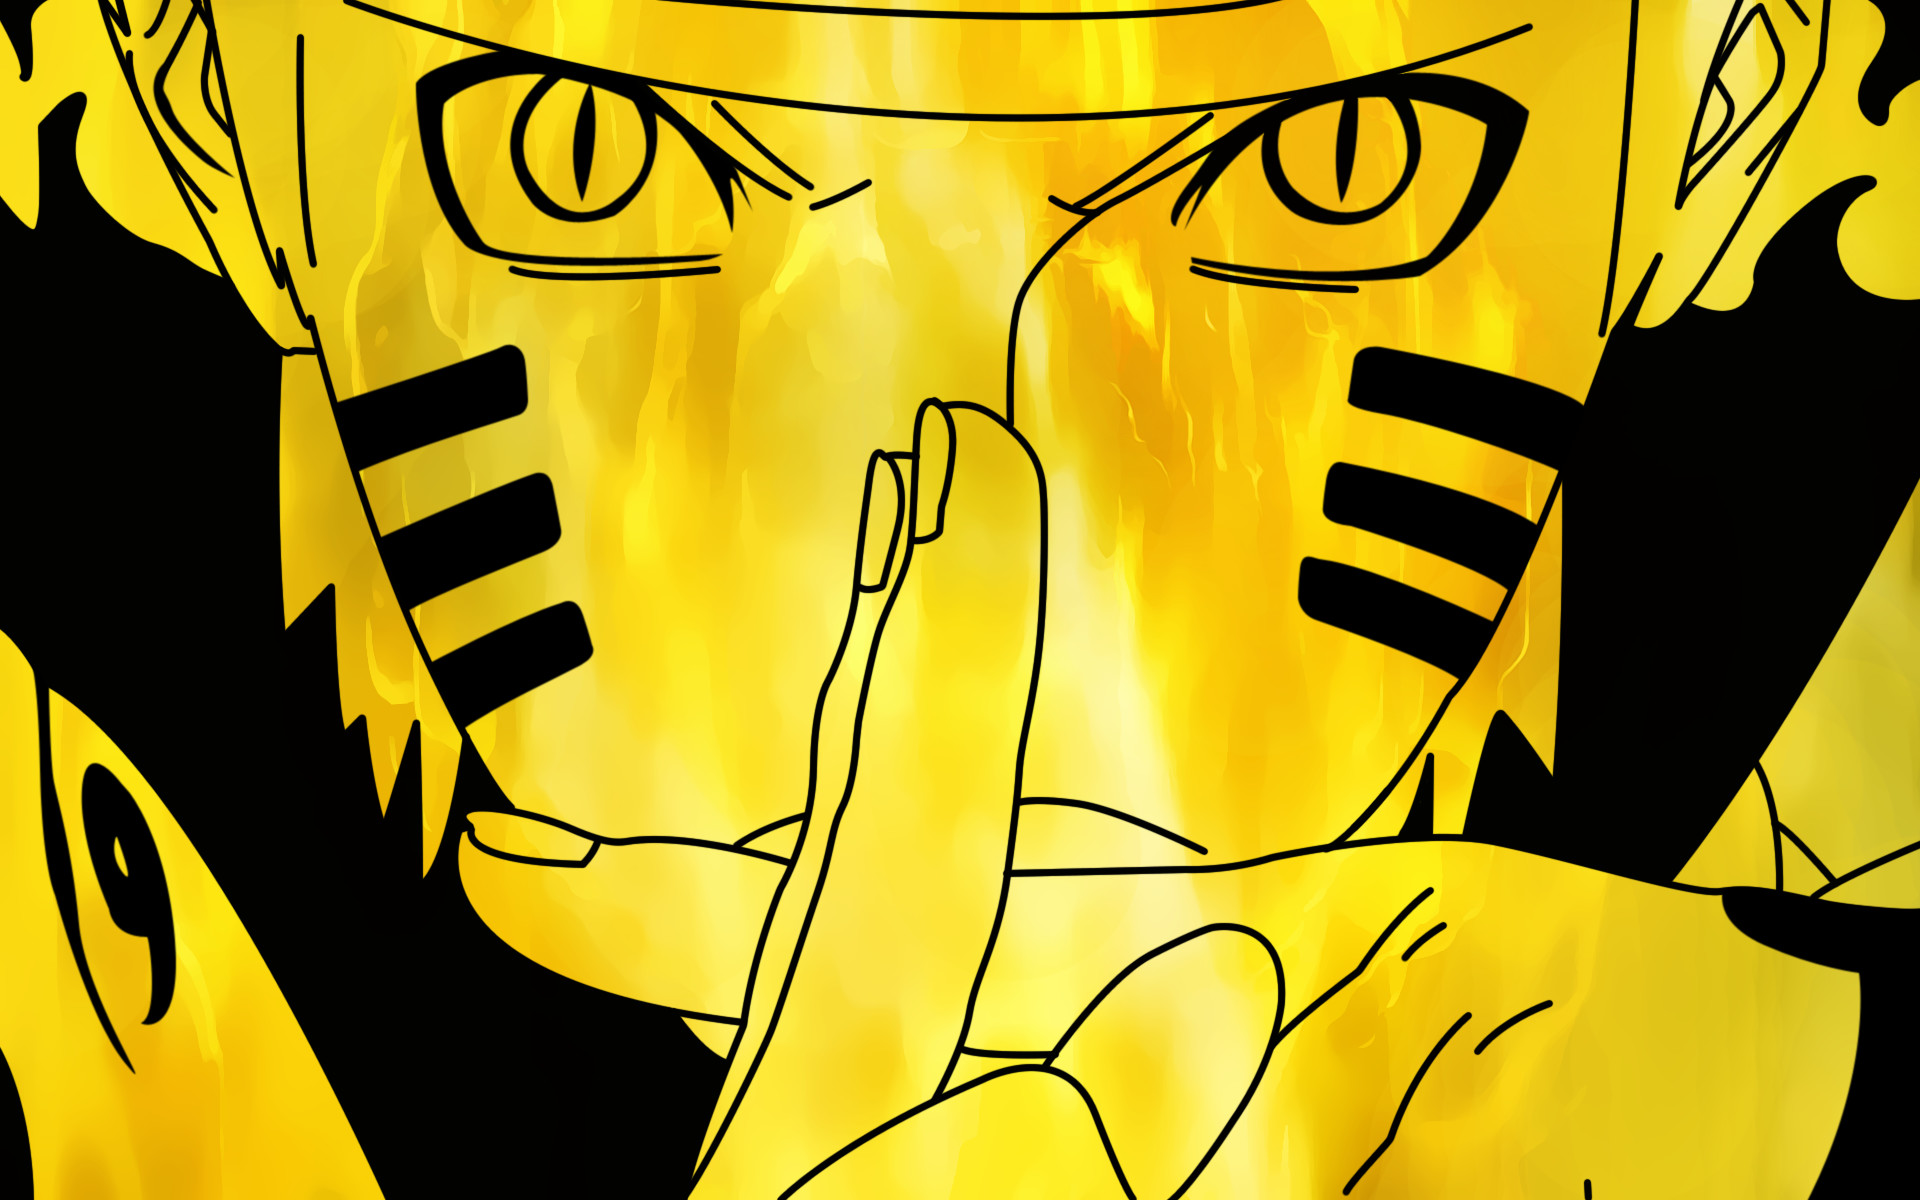 Naruto 1080p Wallpaper For Tablet | Uzumaki Shippuden Sasuke Hokage